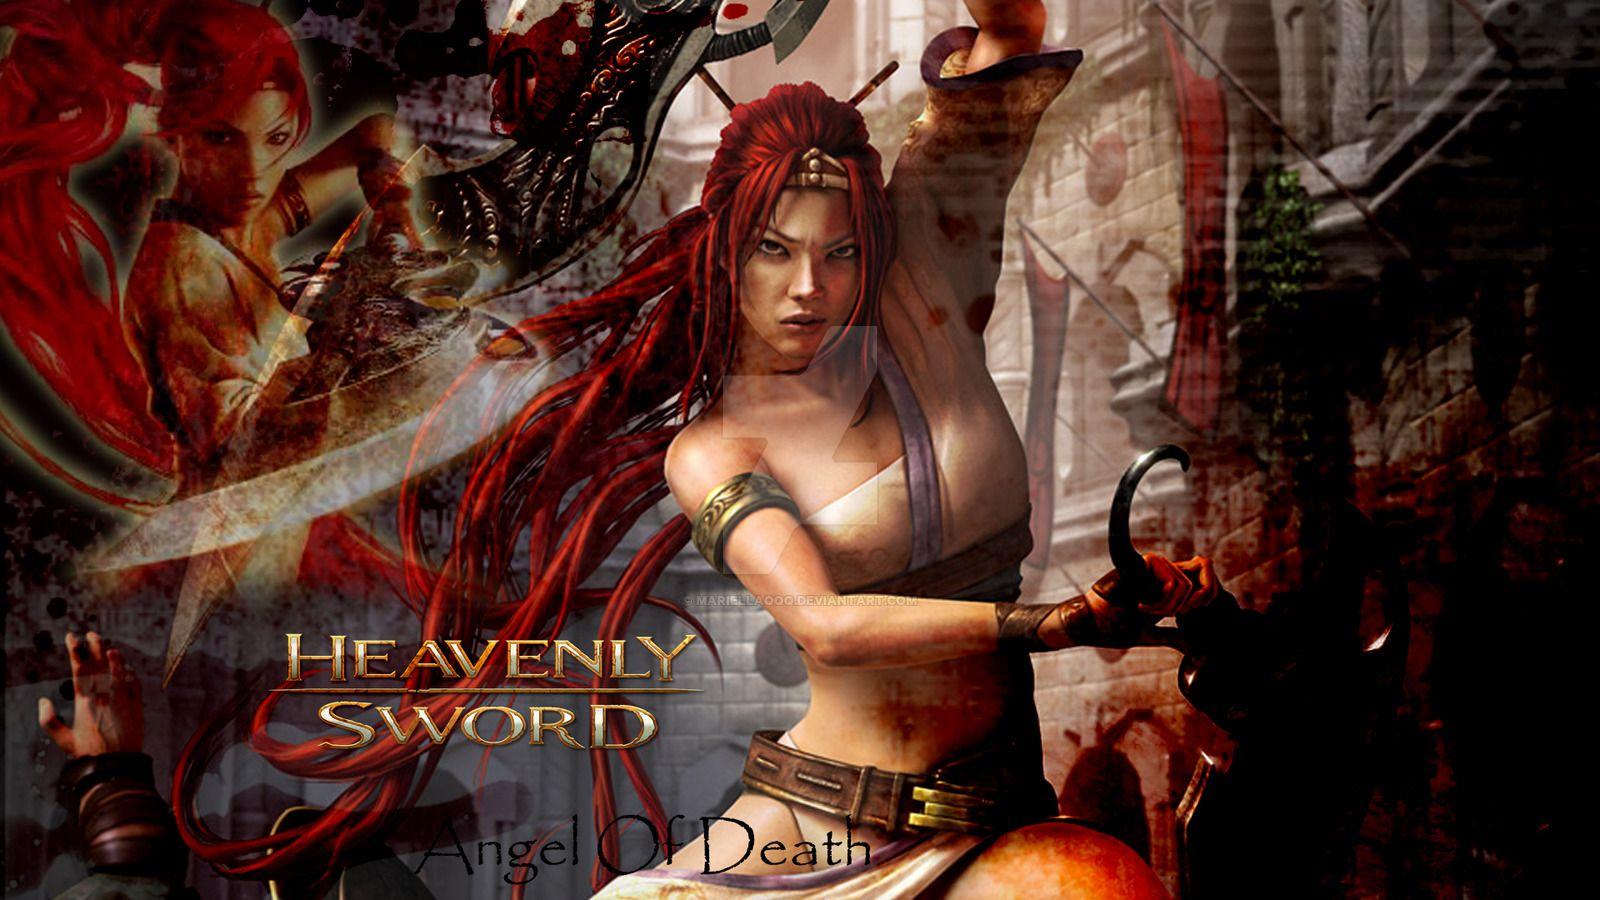 Heavenly Sword Wallpapers HD Wallpaper | Wallpapers 4k ...